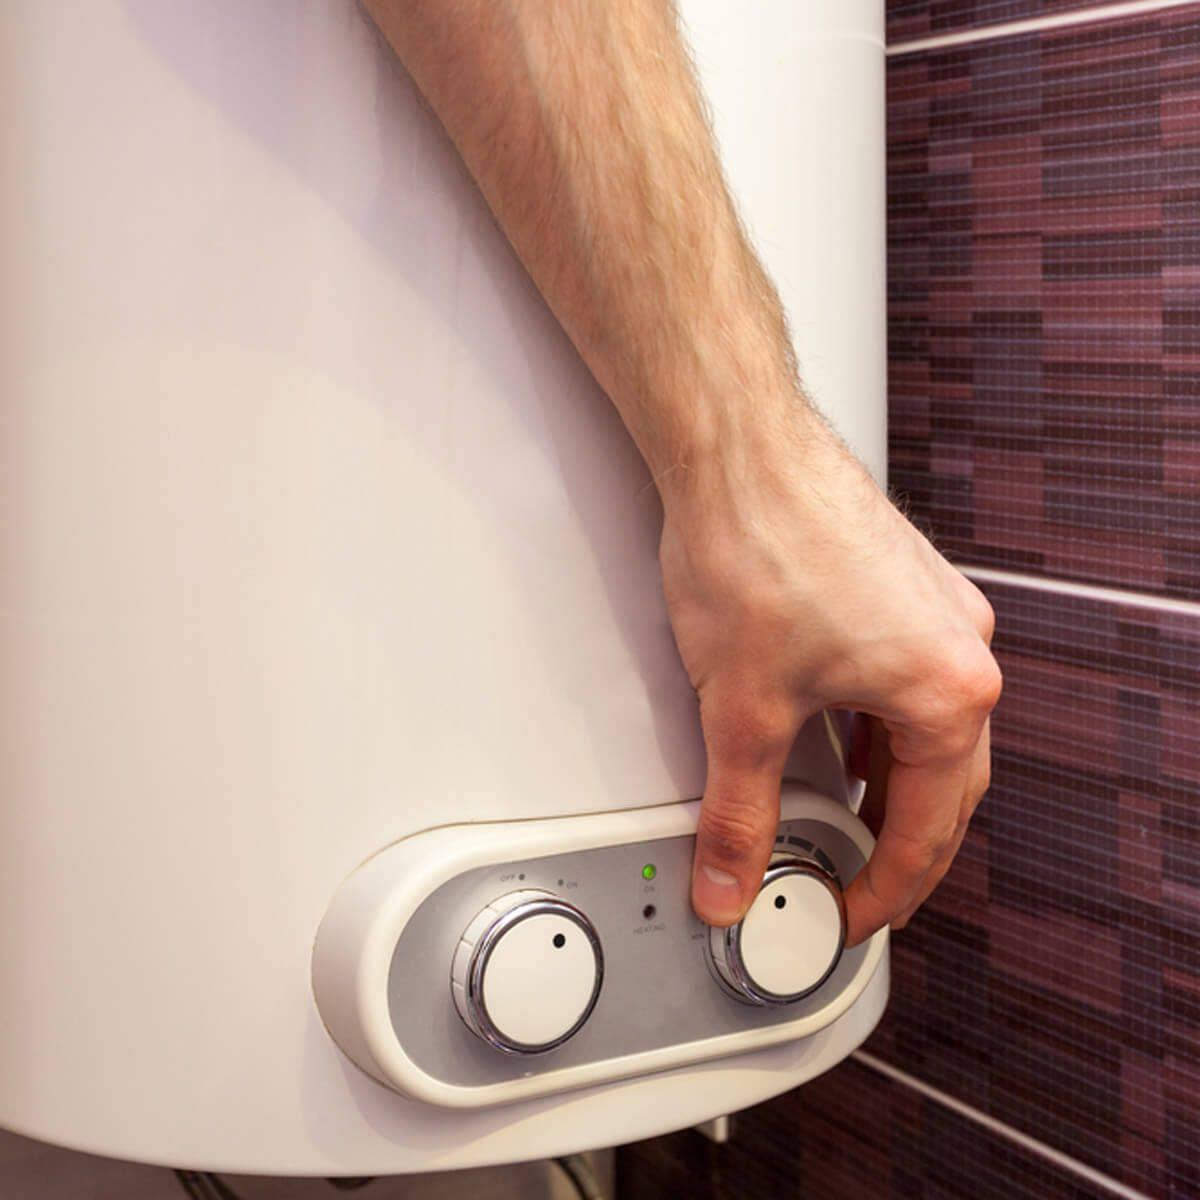 dfh3_shutterstock_433760101 water heater temperature